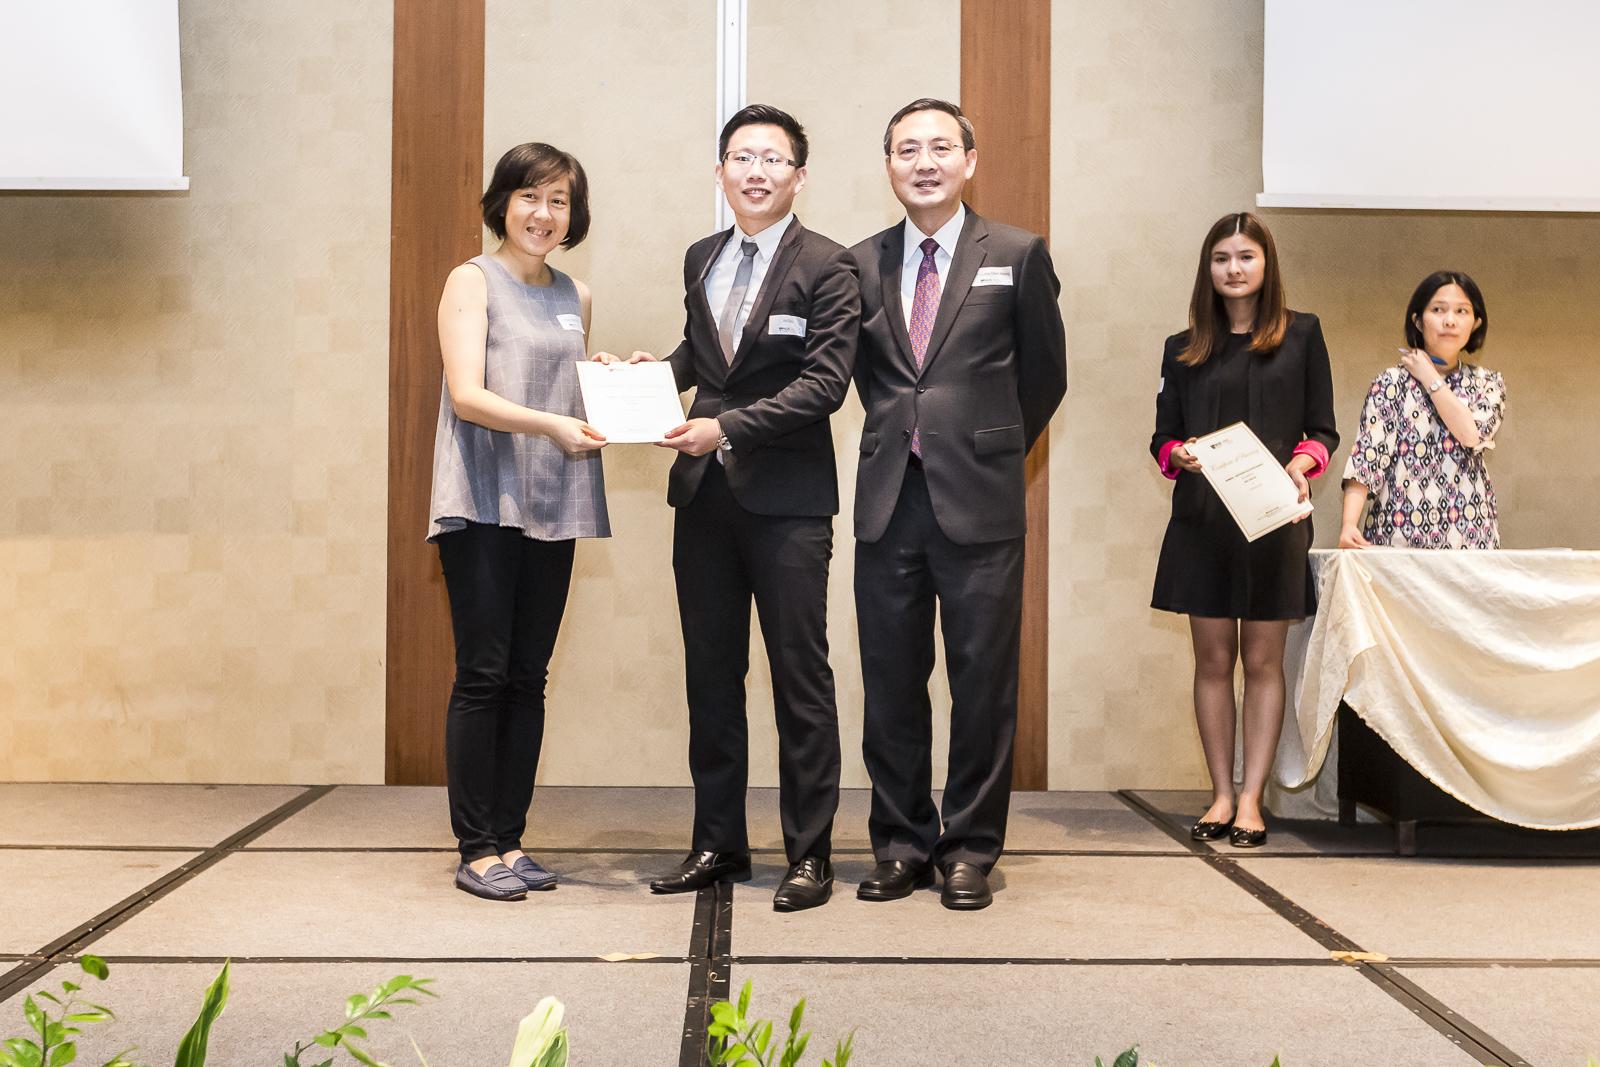 https://www.mhcasia.com/managedcare/wp-content/uploads/2017/02/MHC-Asia-Group-Bursary_Awarding-Certificate2.jpg